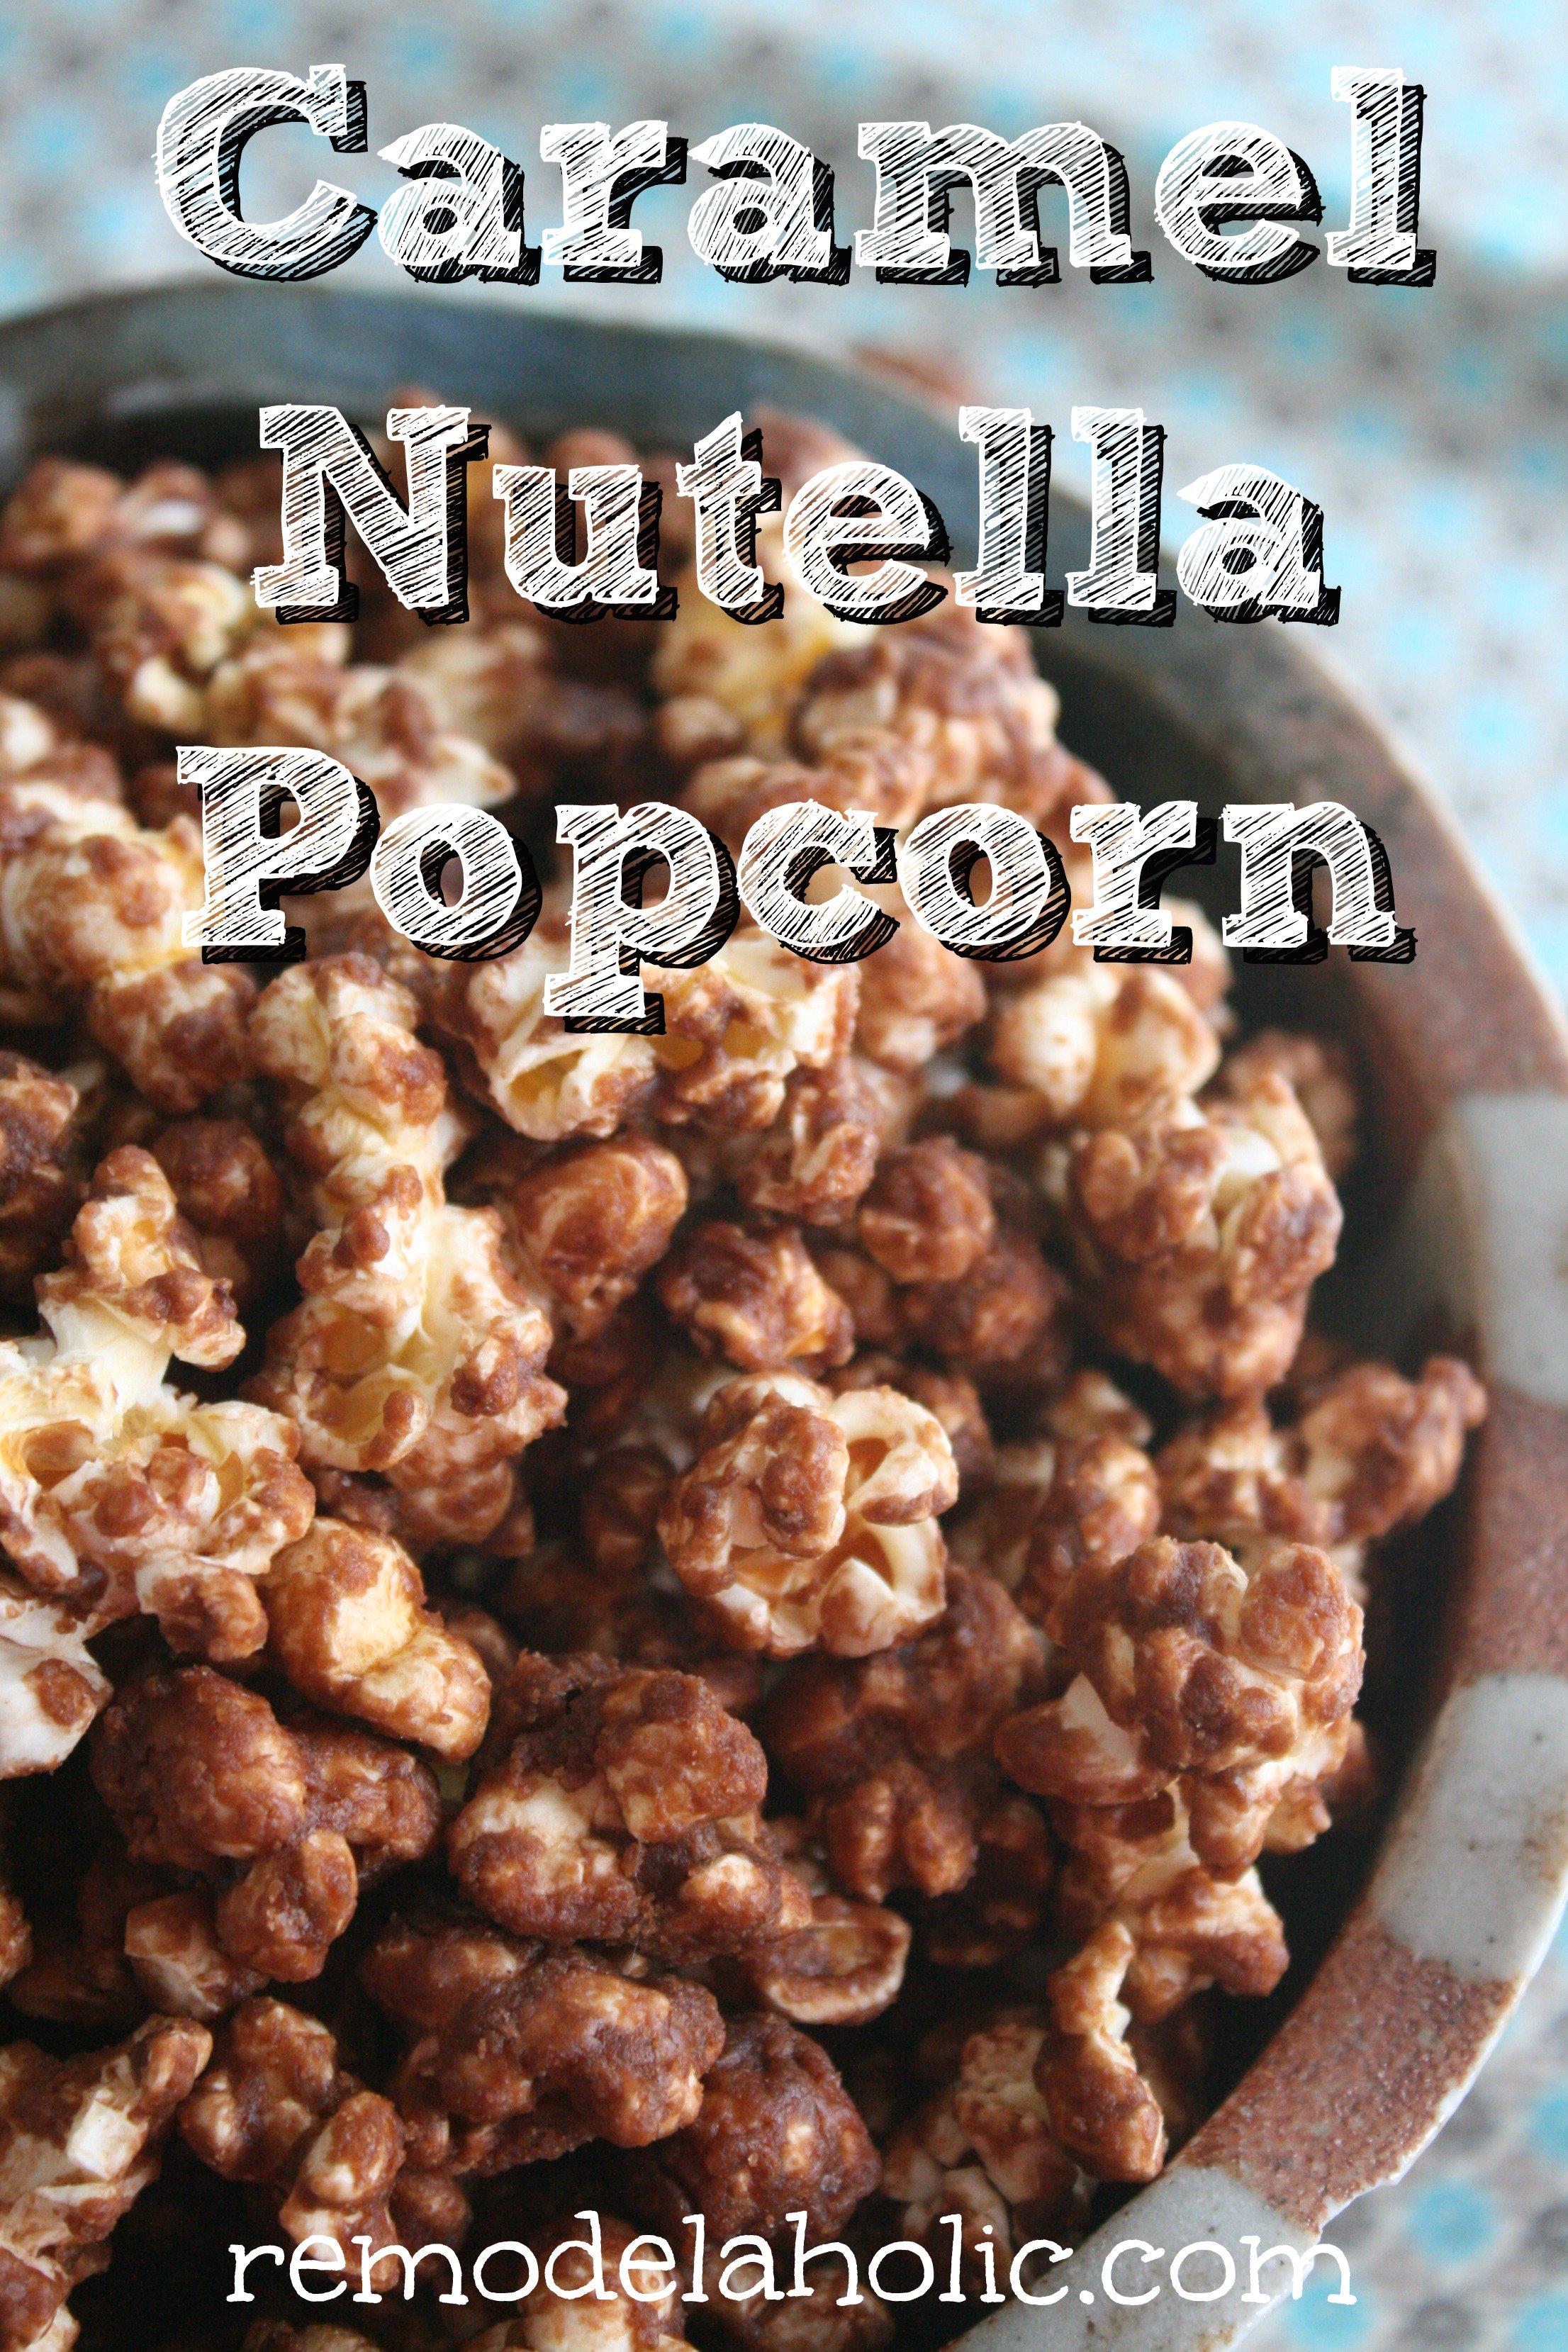 http://www.remodelaholic.com/wp-content/uploads/2013/09/Caramel-Nutella-Popcorn-Recipe-Remodelaholic.jpg